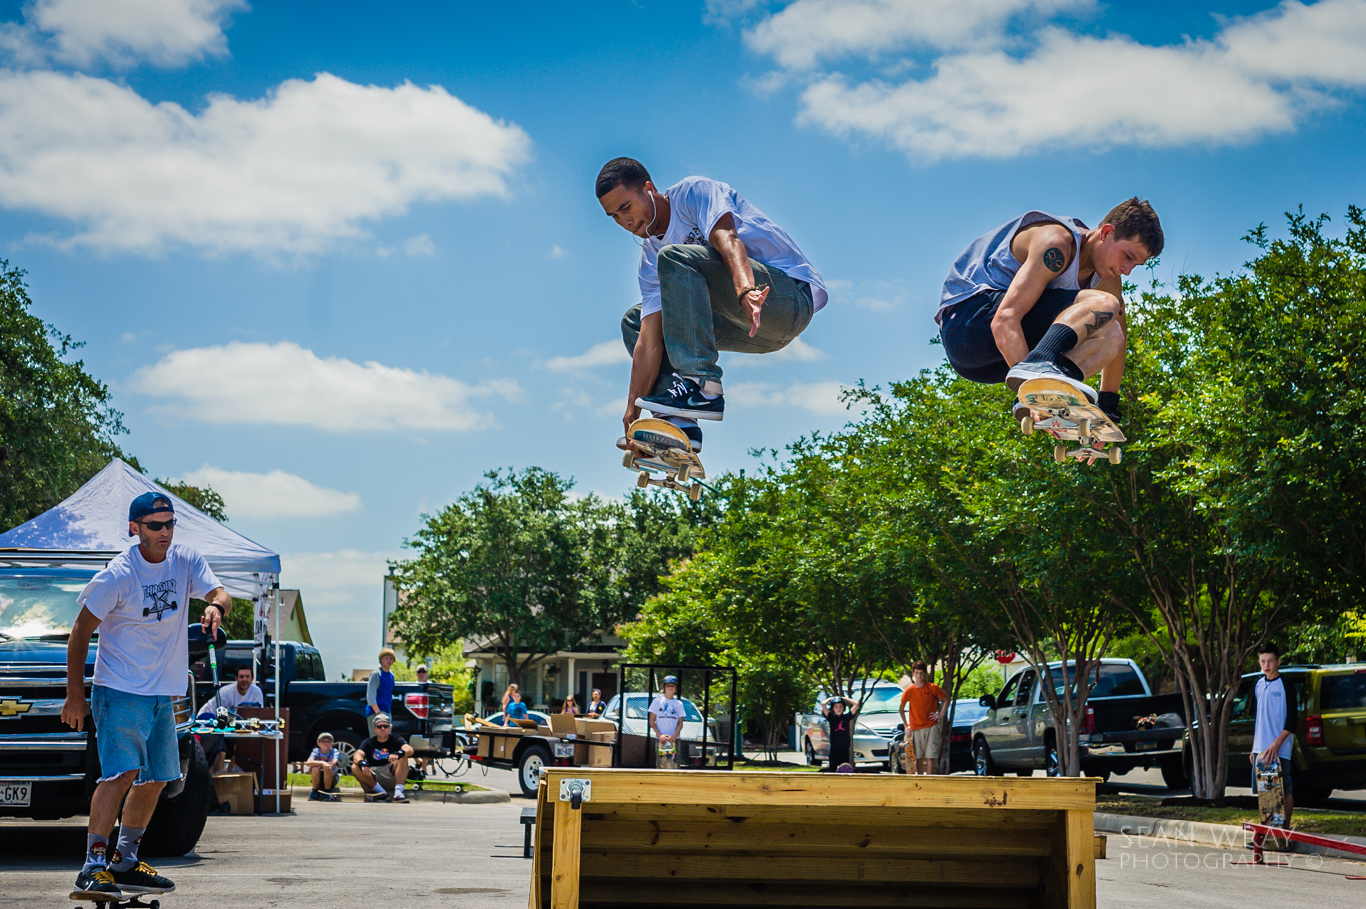 20140518_Skateboard_0004.jpg